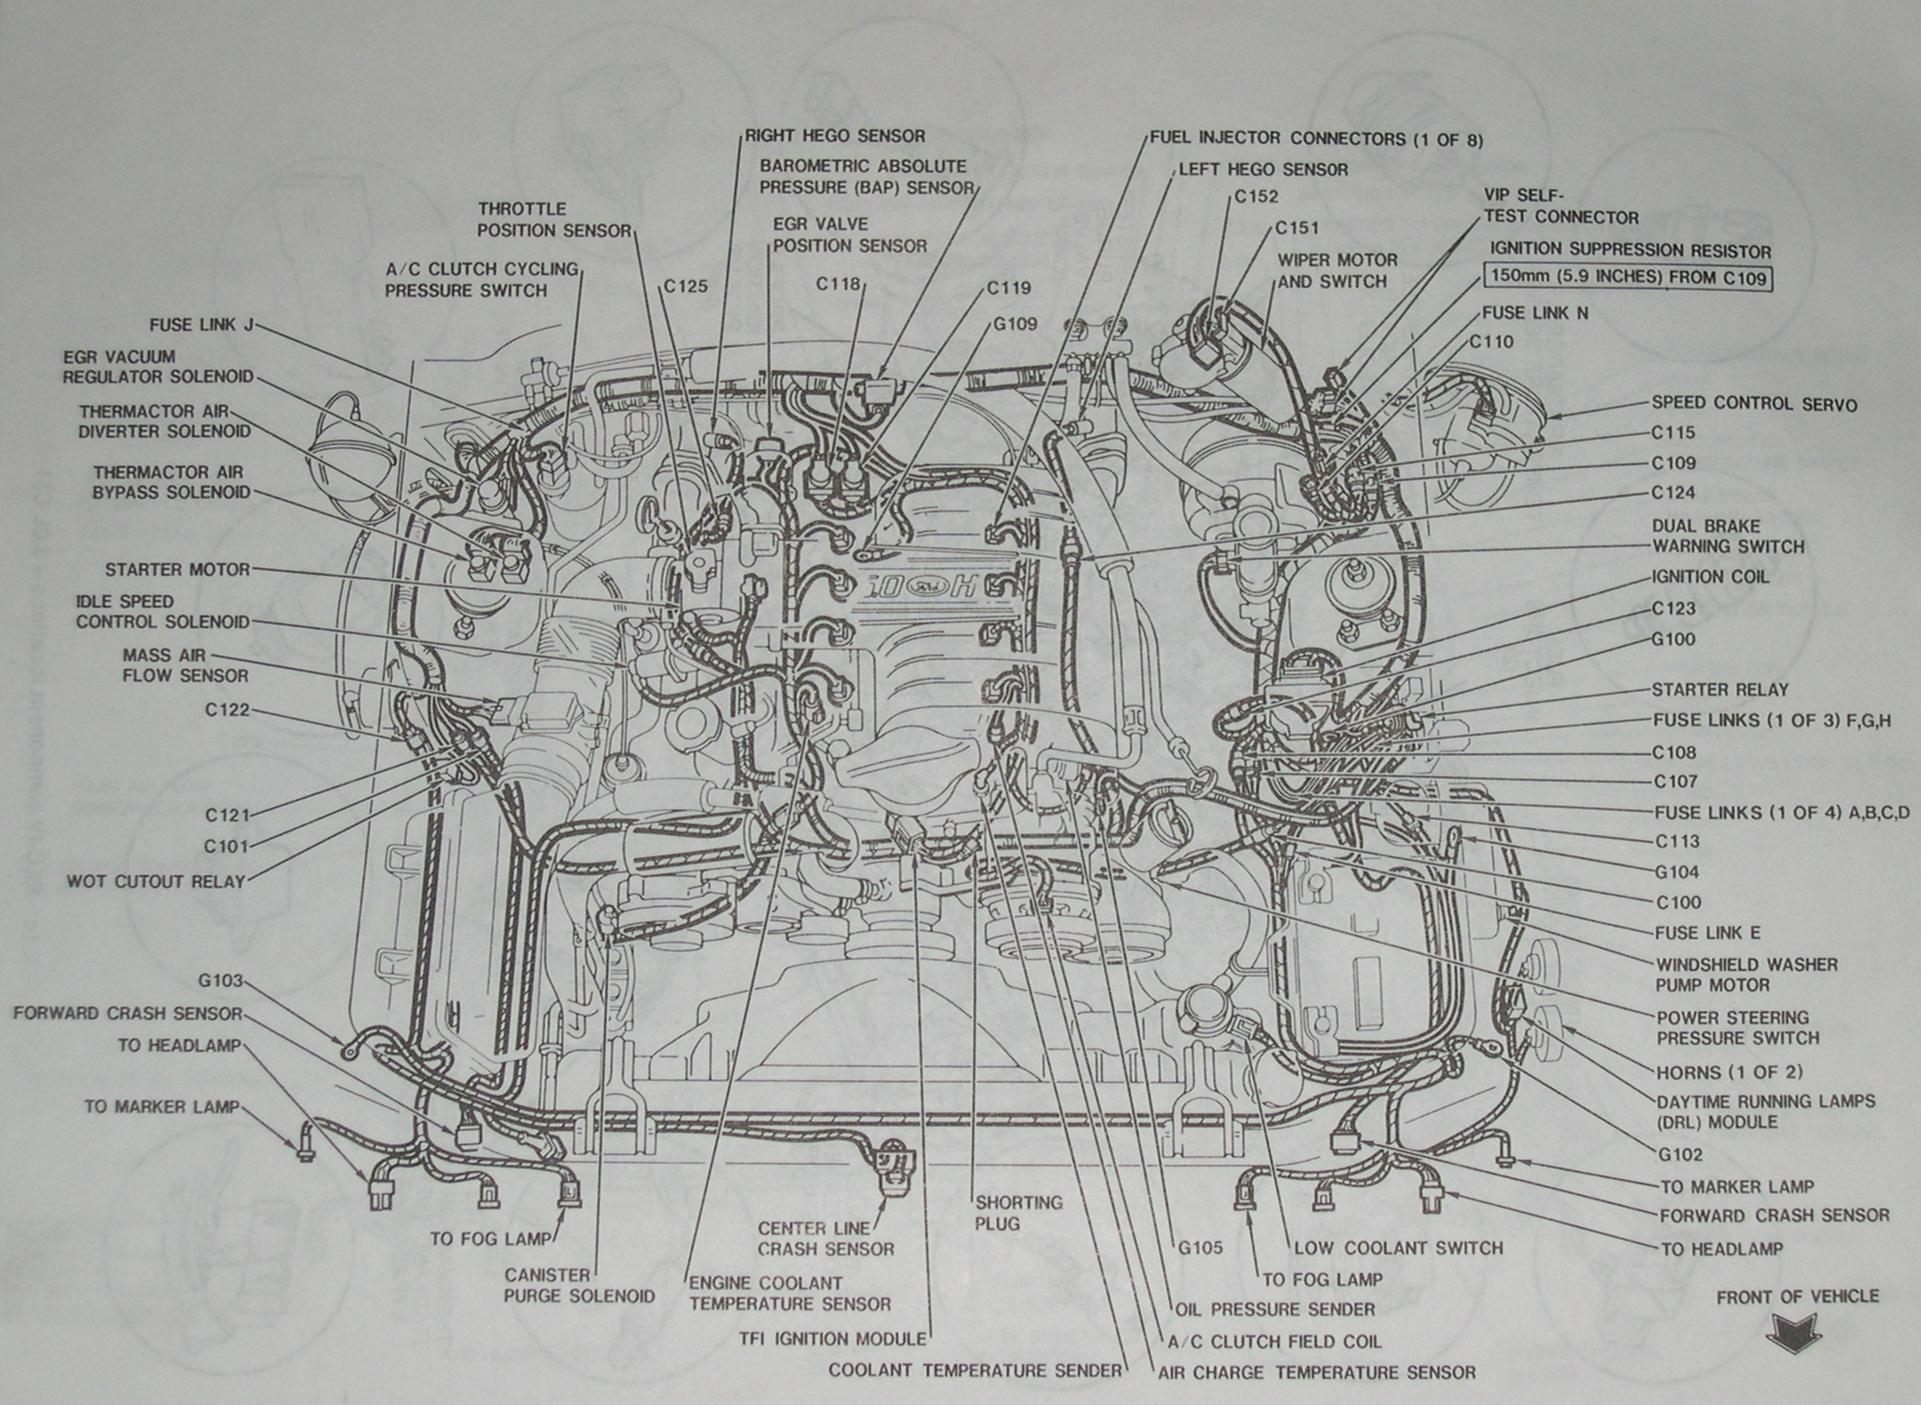 1990 mustang gt dash wiring harness wiring diagram sys 1993 Mustang Wiring Diagram